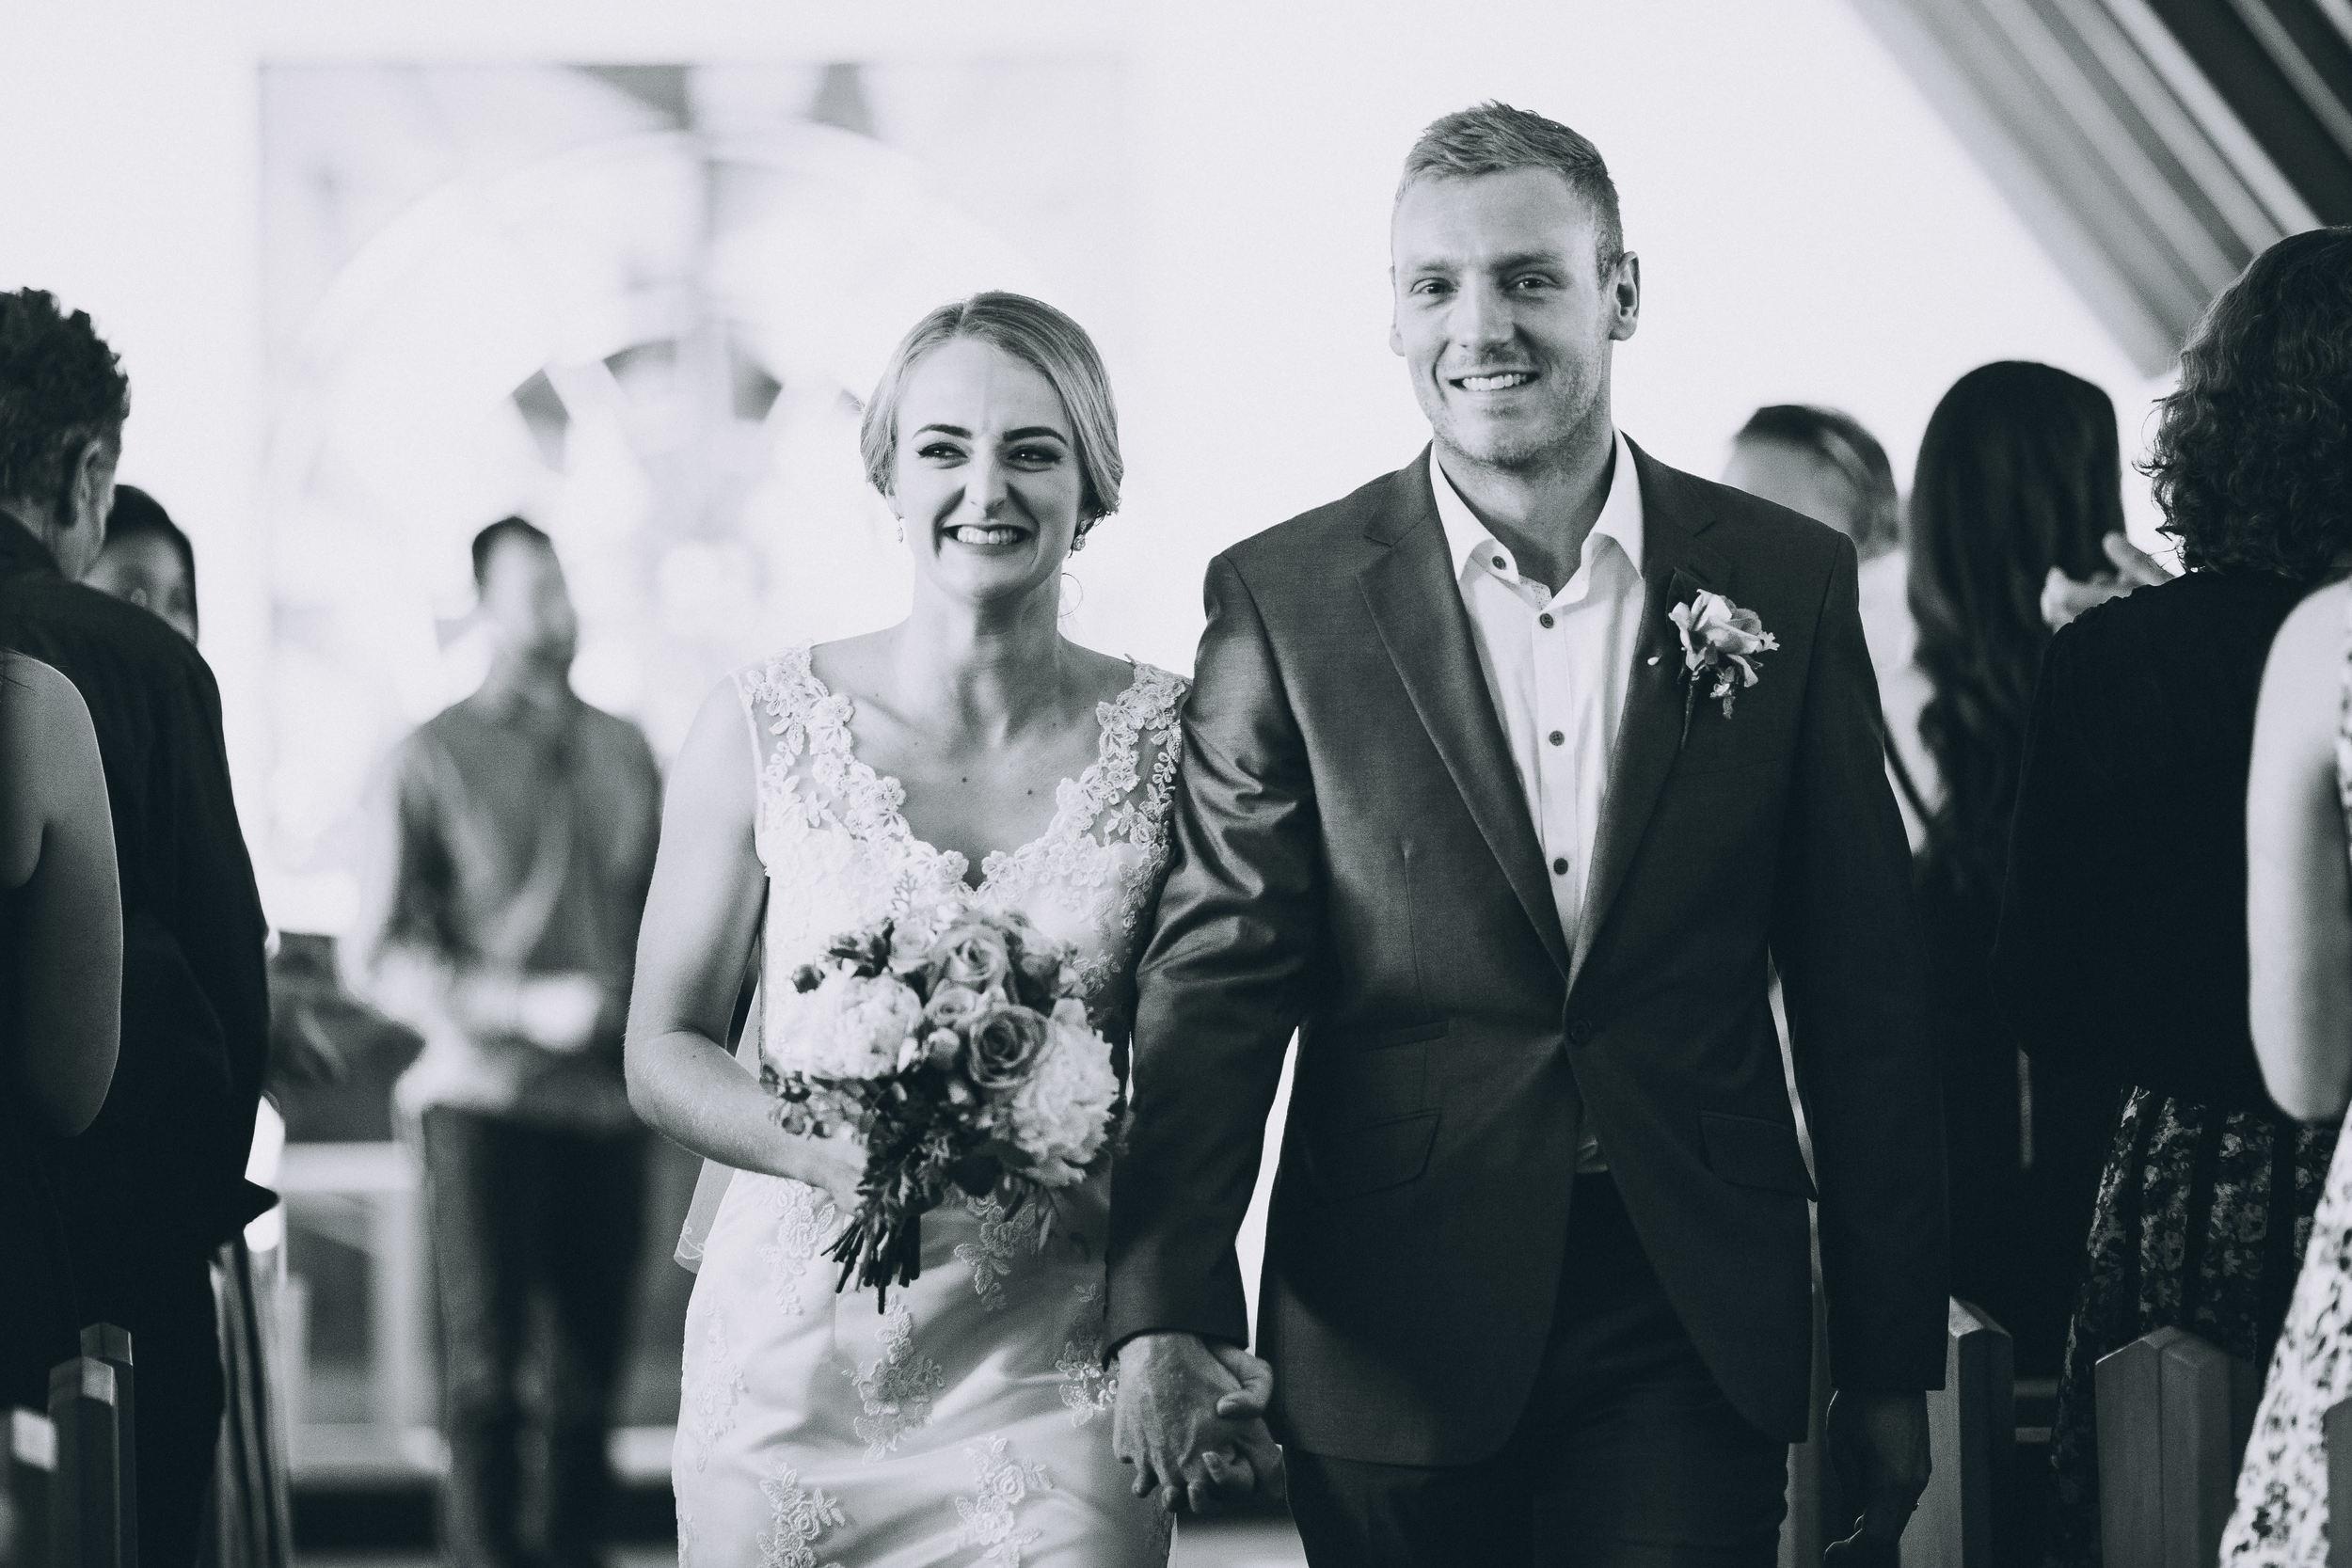 Shivonne & James - Ceremony Monochrome-283.jpg